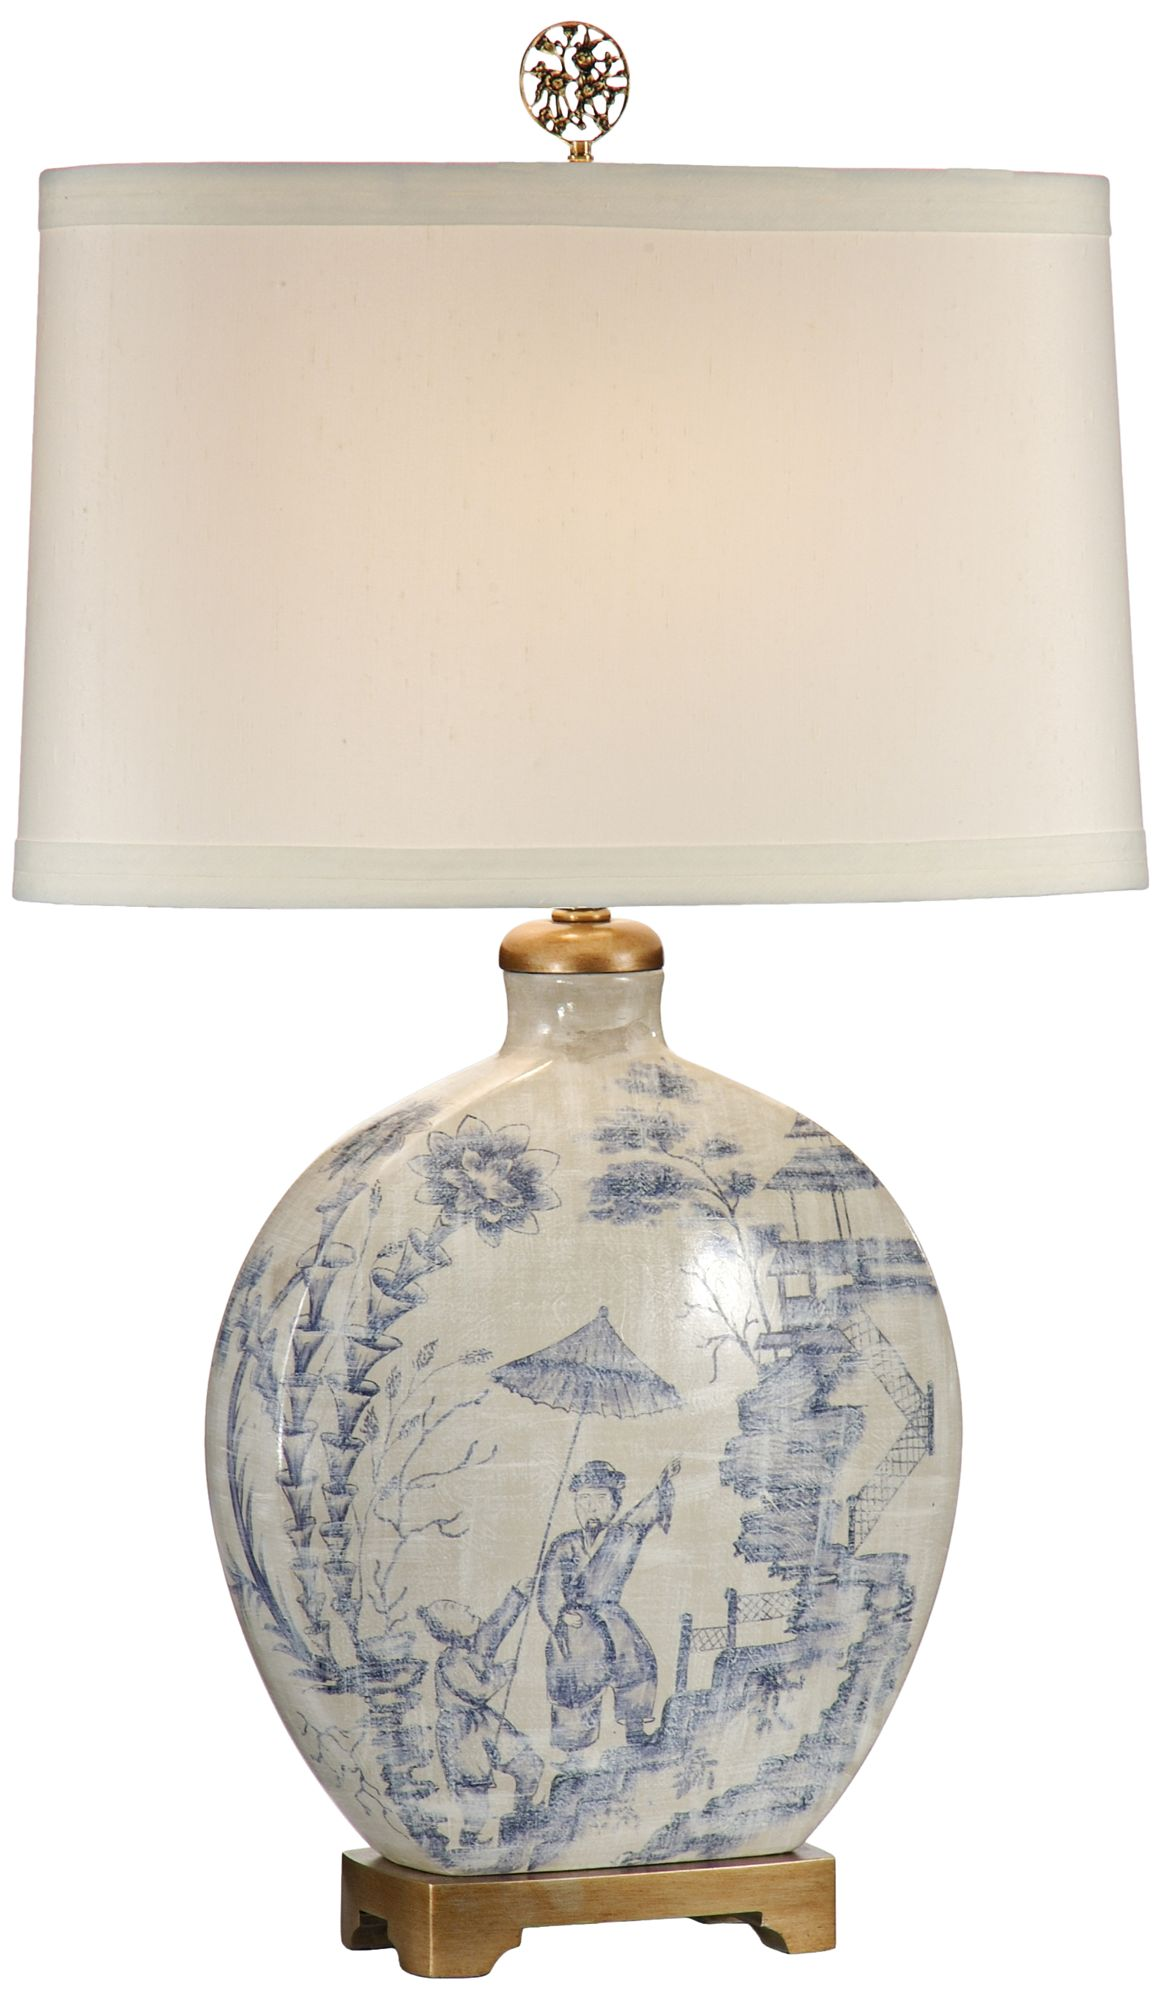 Wildwood Ancient Snuff Bottle Porcelain Table Lamp